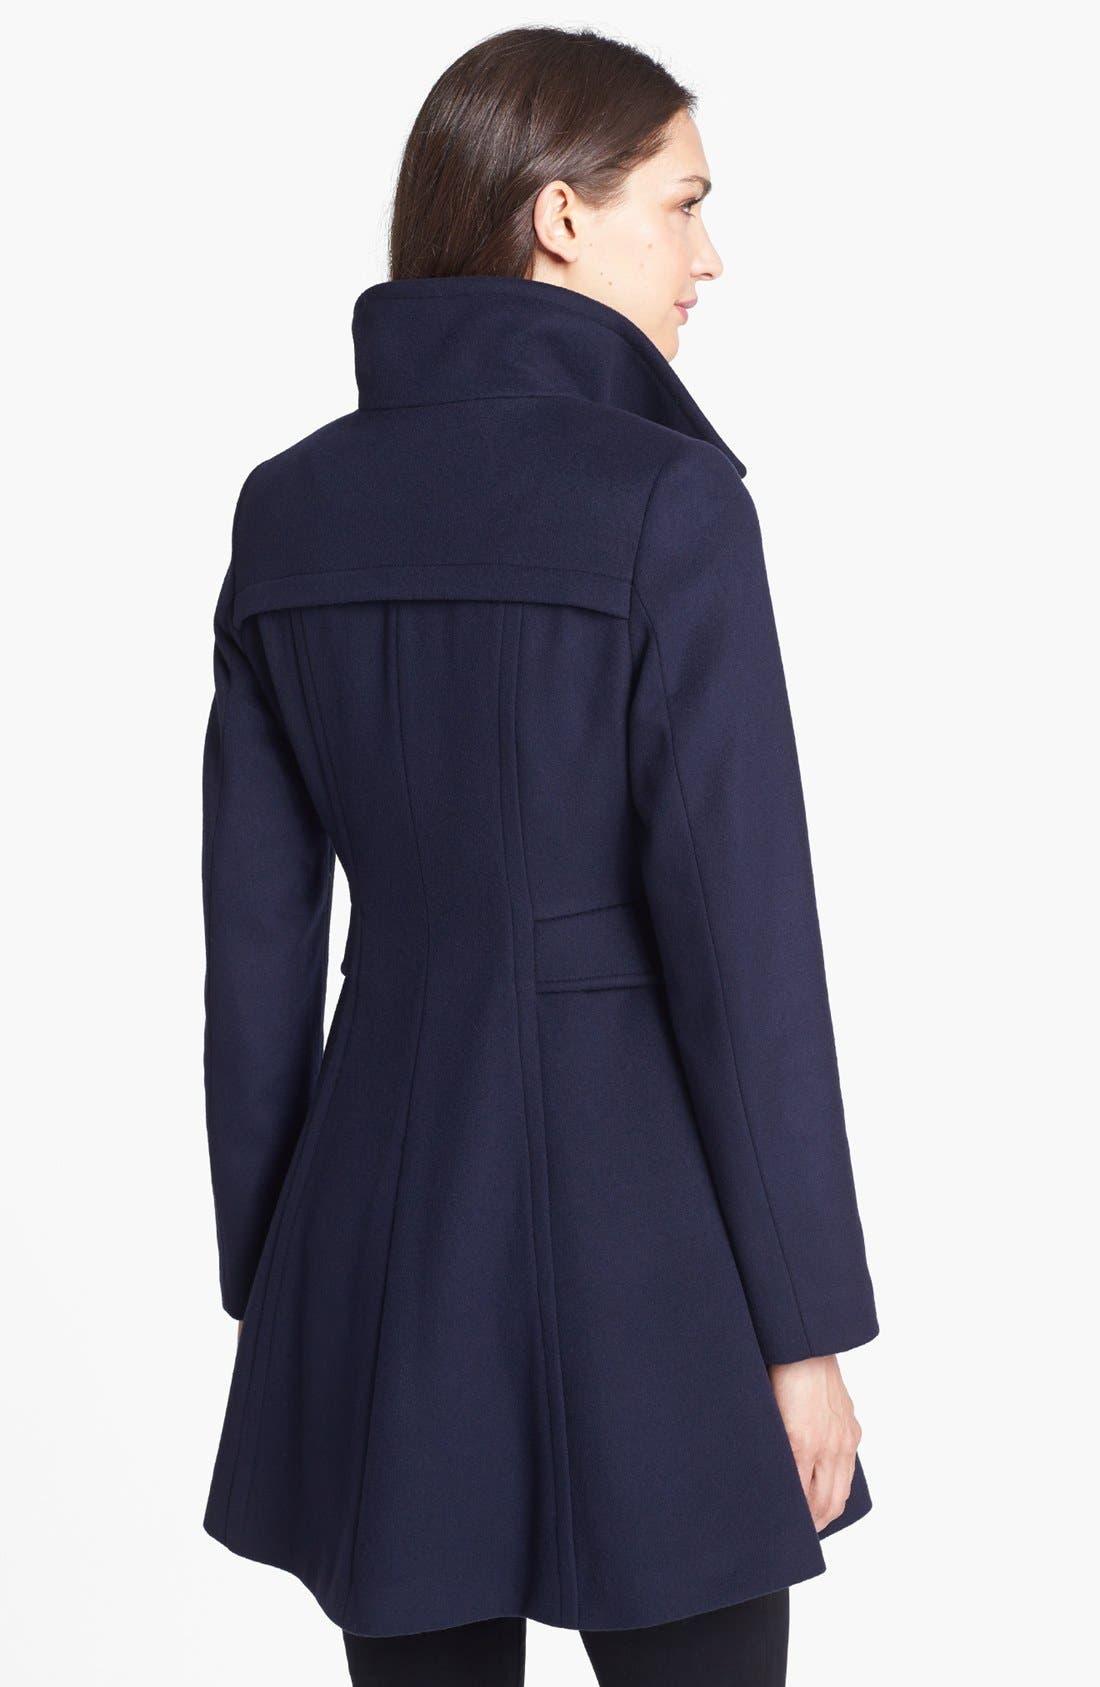 Alternate Image 2  - Trina Turk Lambswool & Cashmere Officer's Coat (Petite)